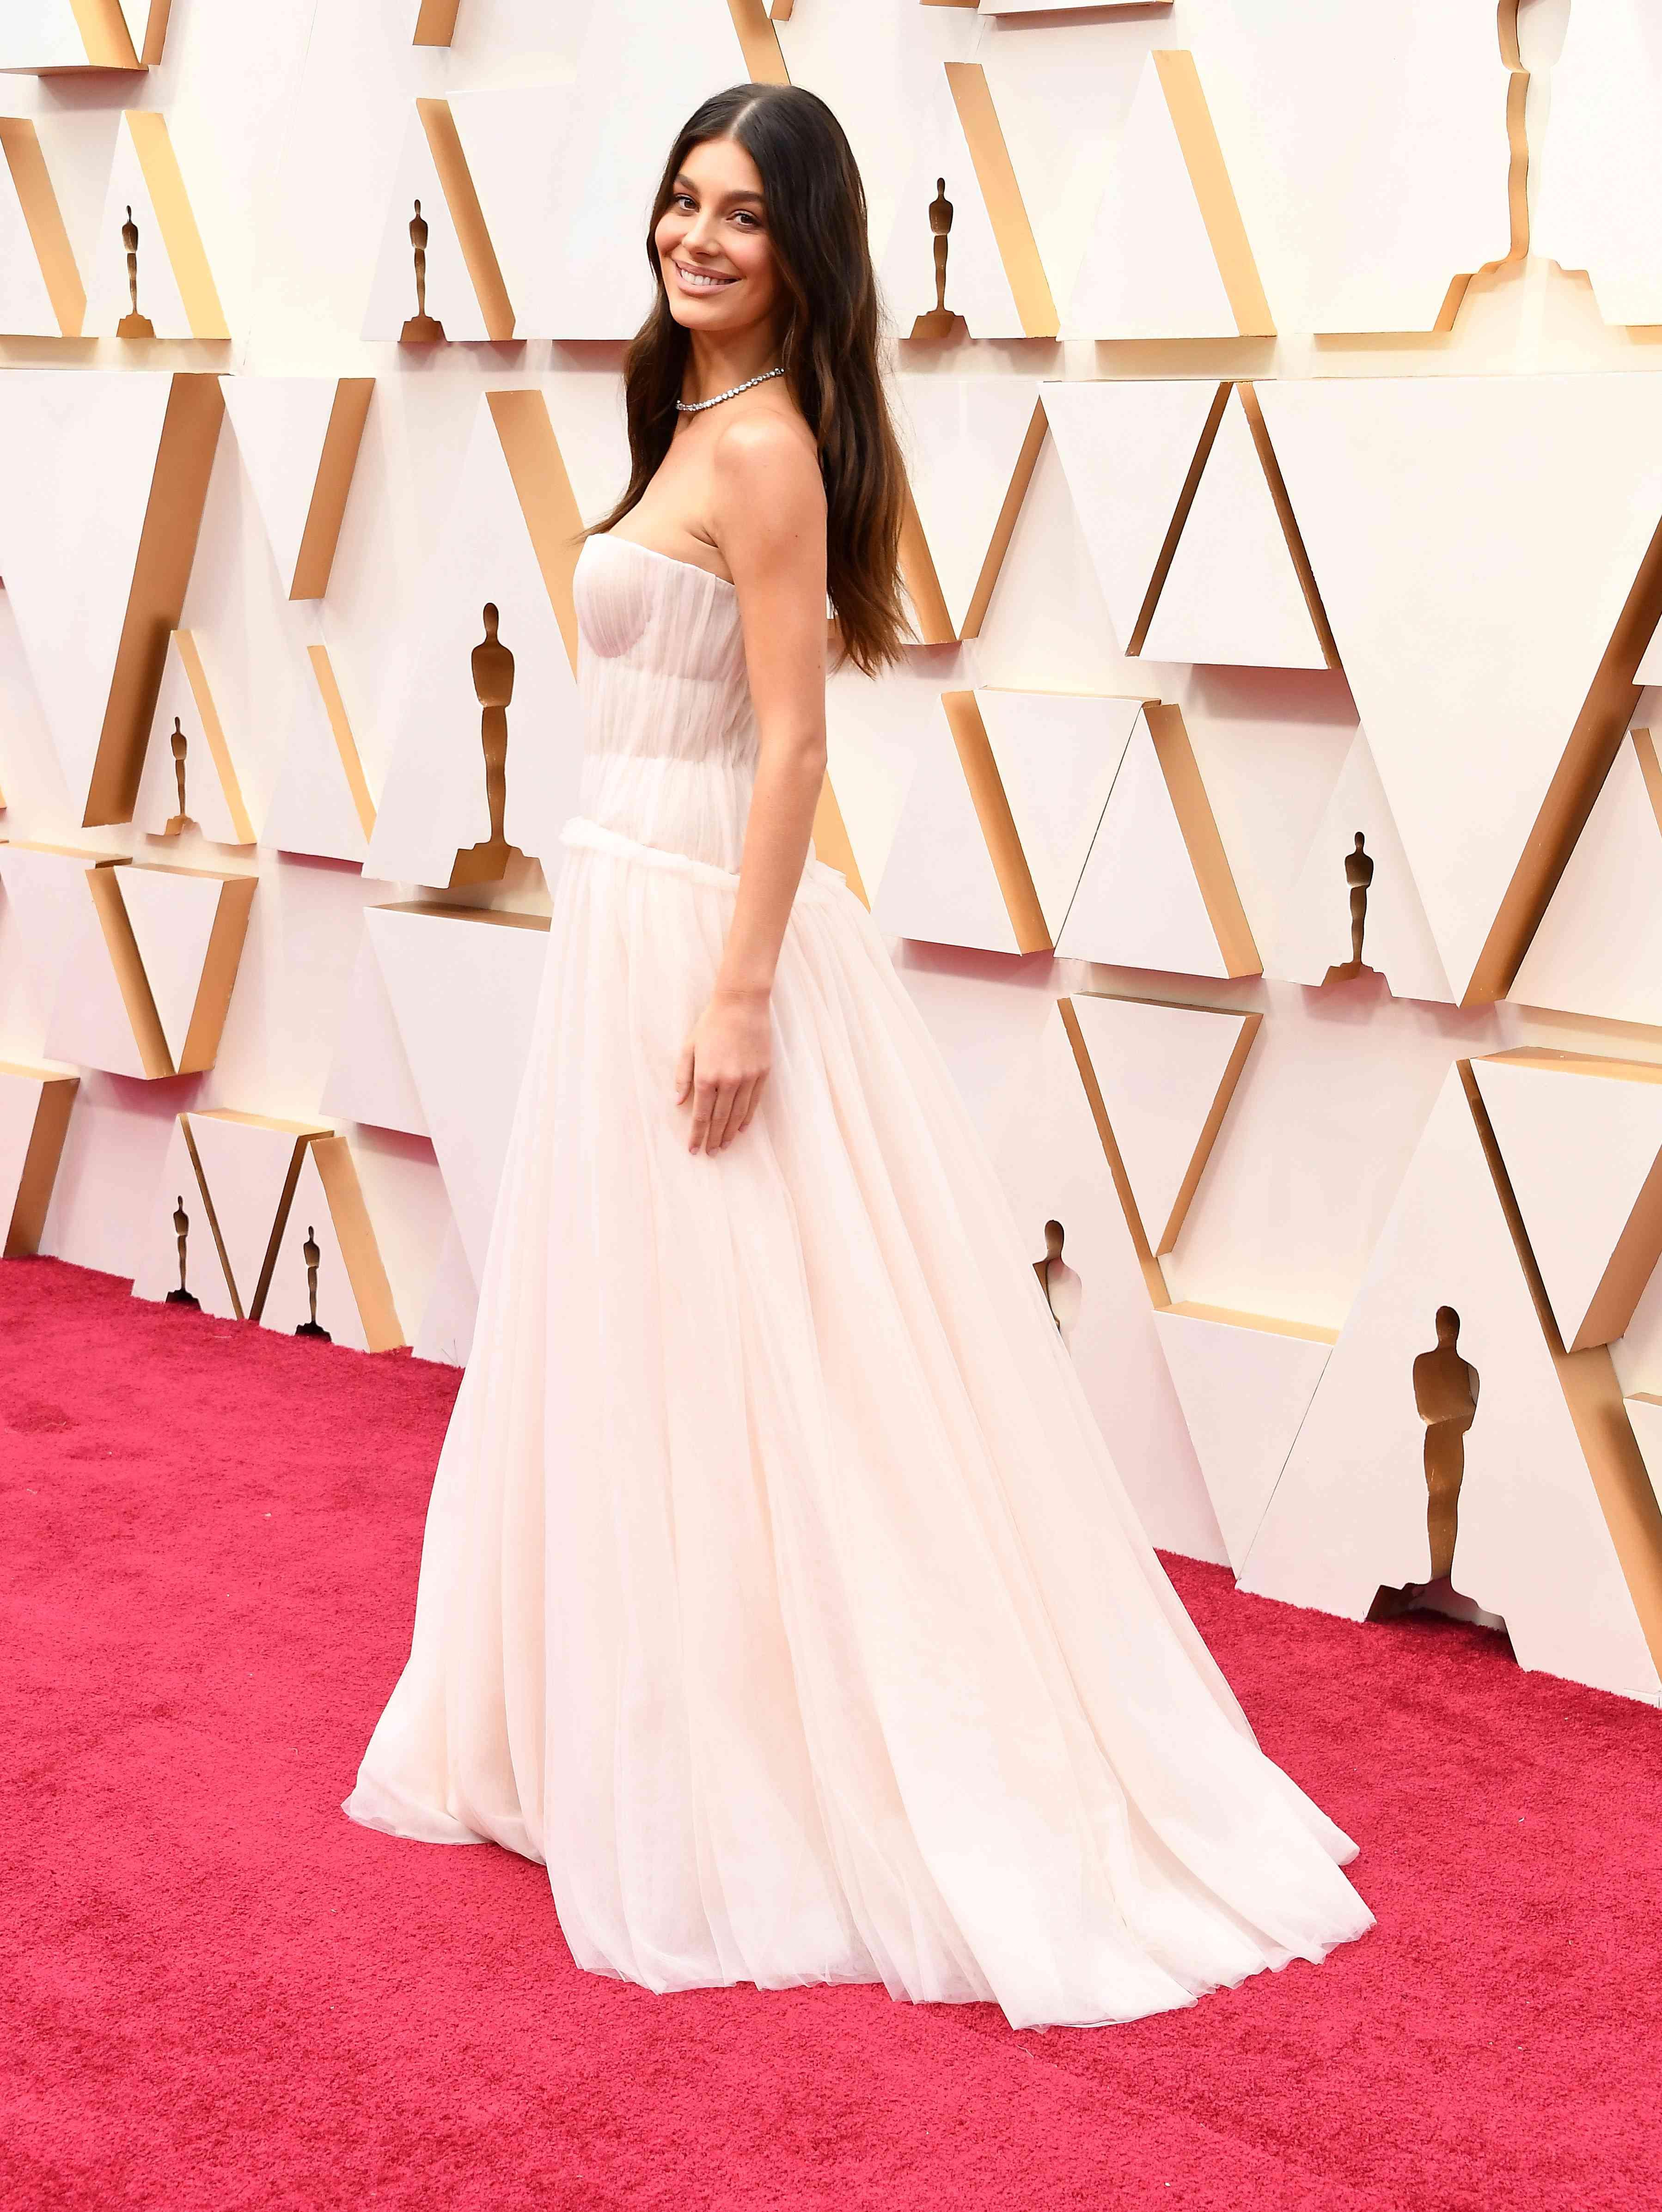 Model Camila Morrone poses on the Oscars red carpet